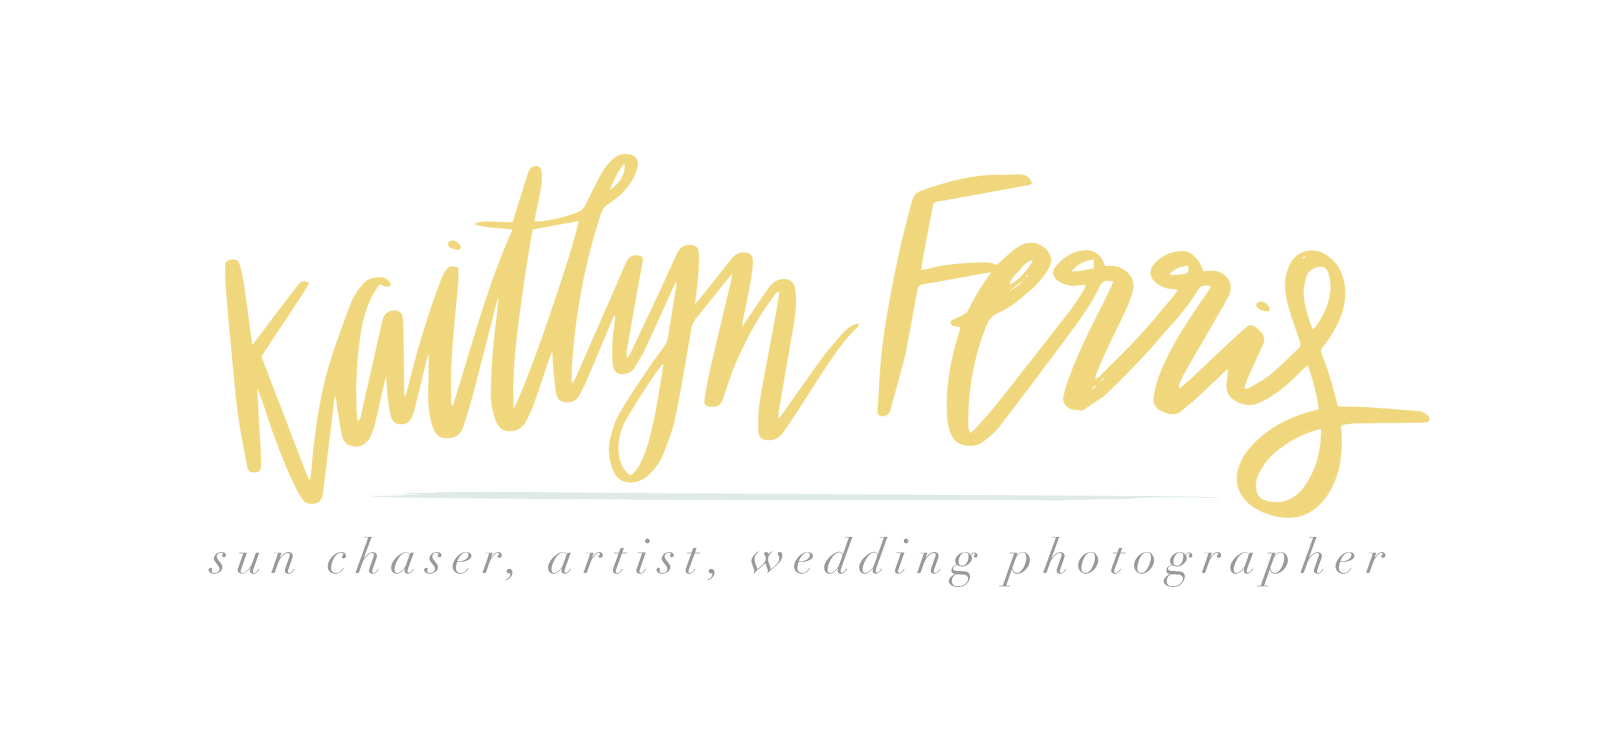 Kaitlyn Ferris Wedding Photography